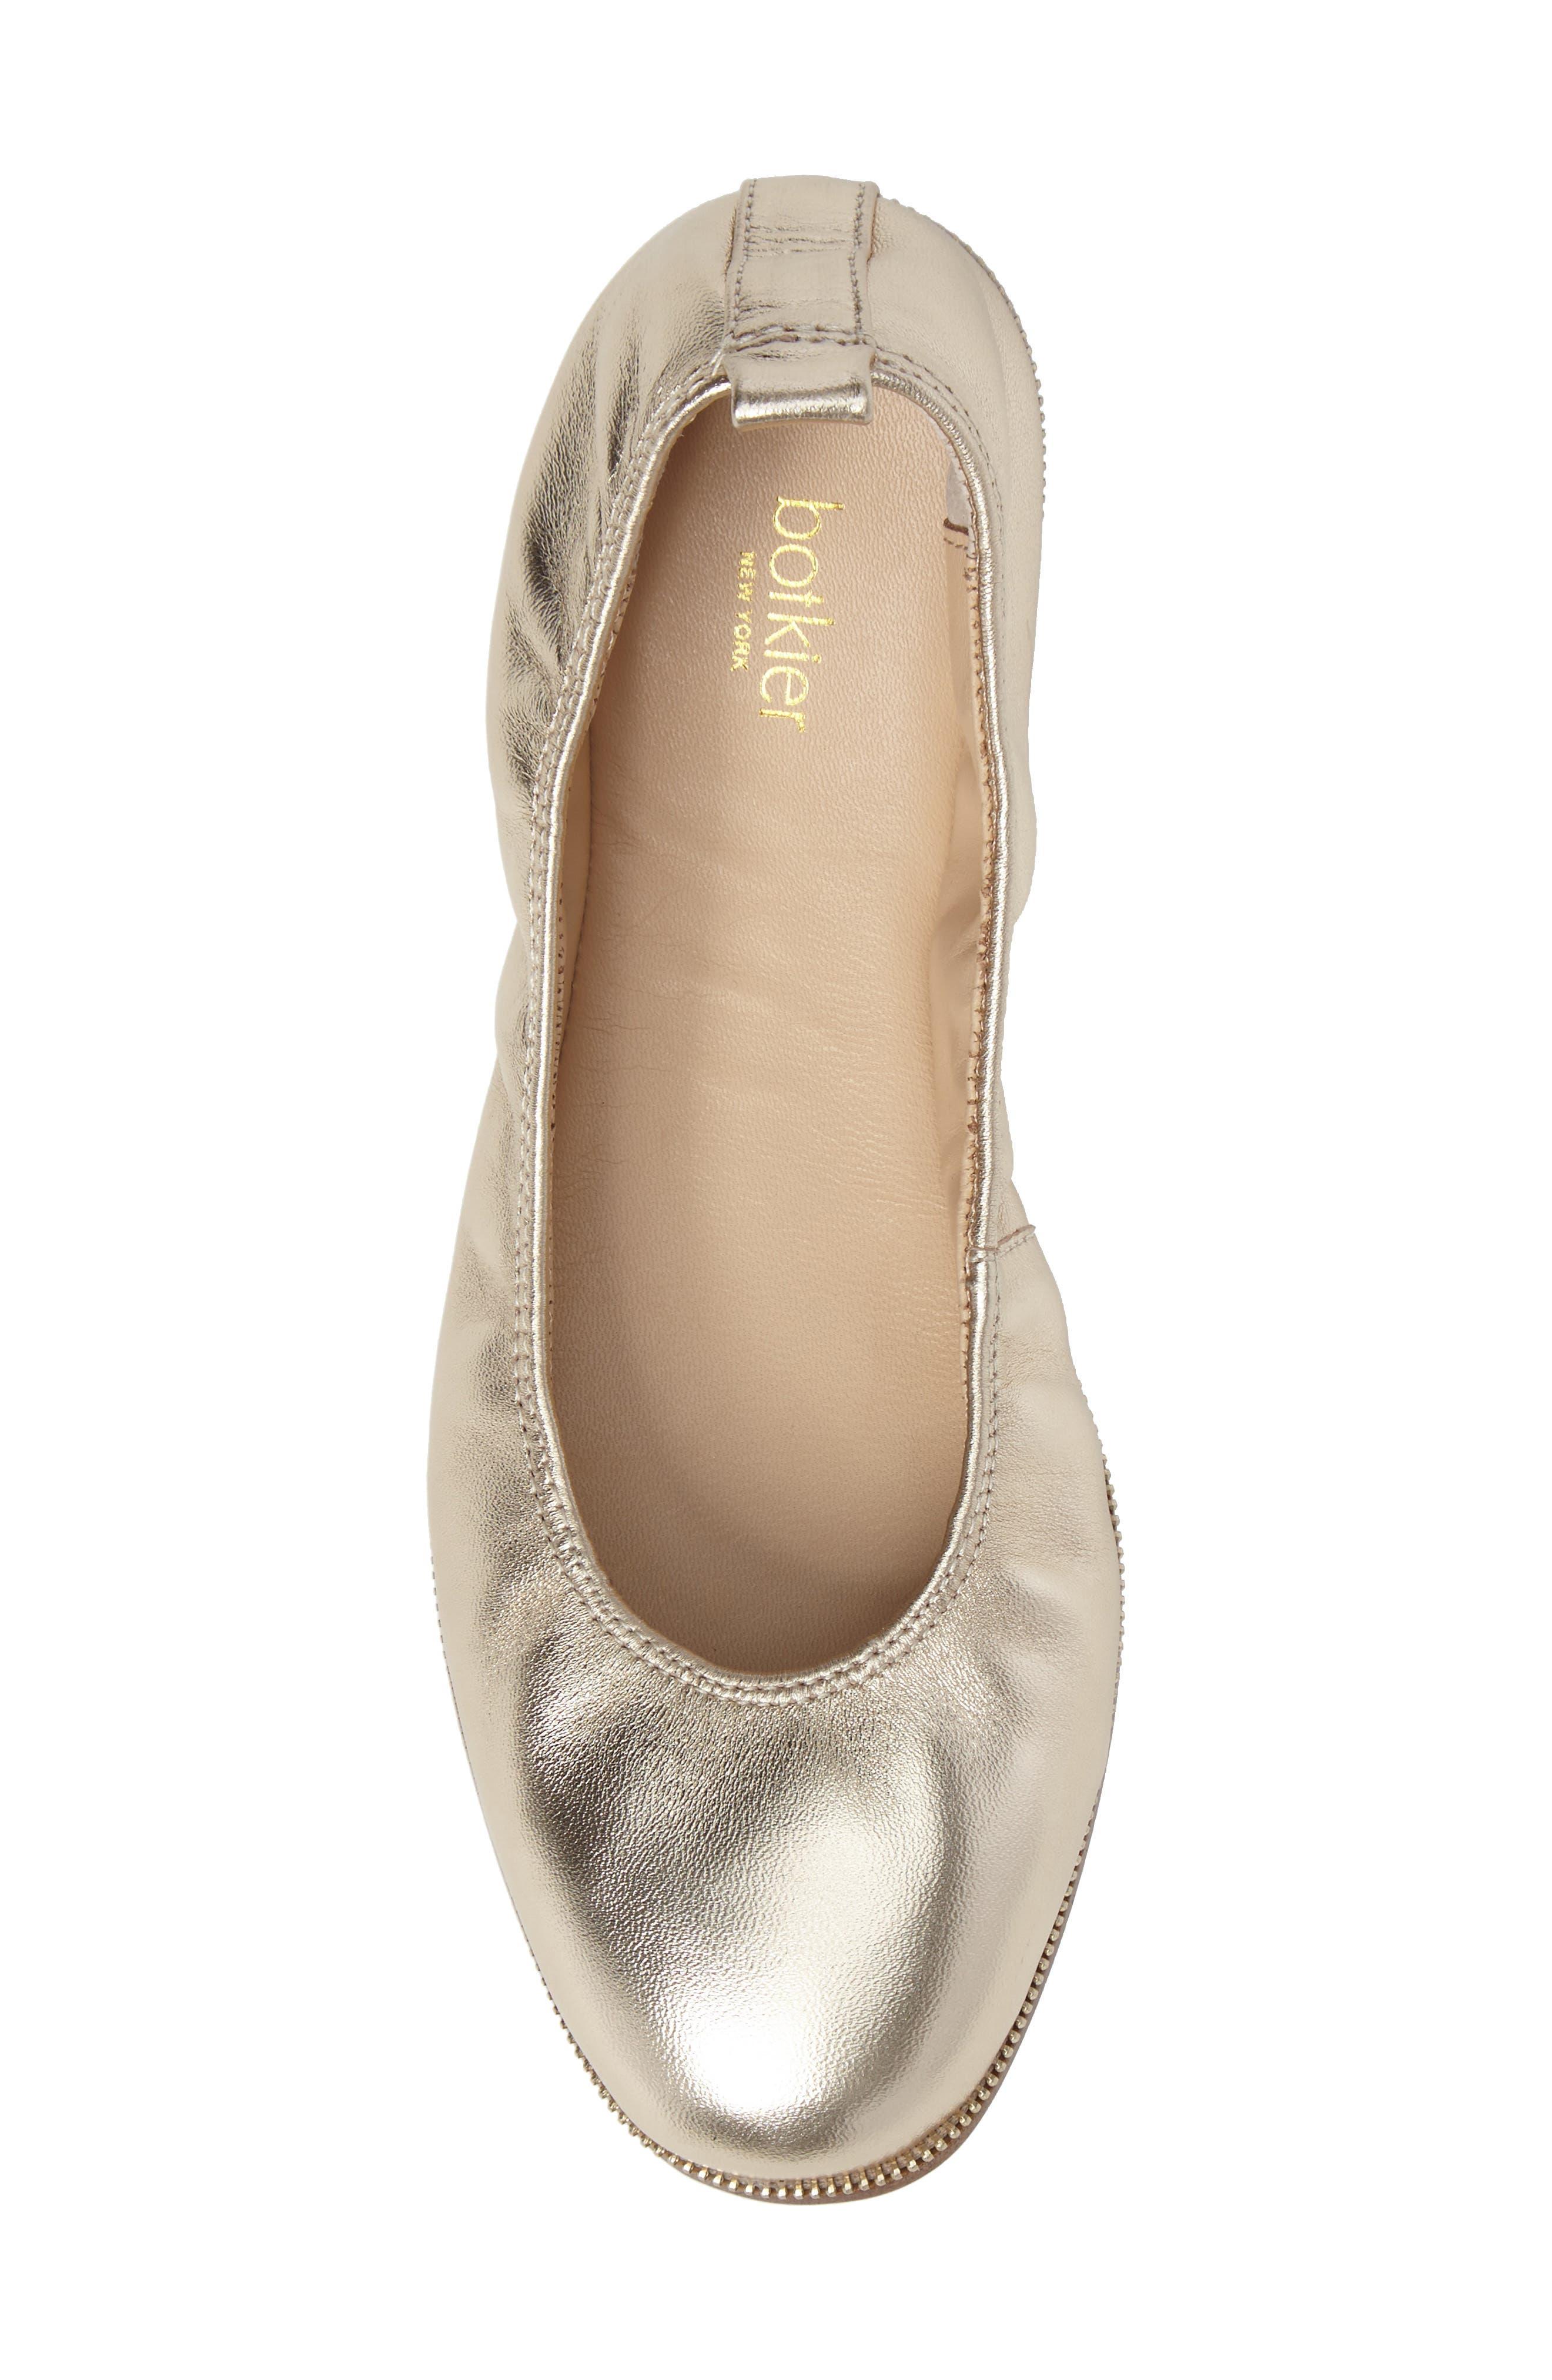 Mason Ballet Flat,                             Alternate thumbnail 5, color,                             GOLD METALLIC NAPPA LEATHER